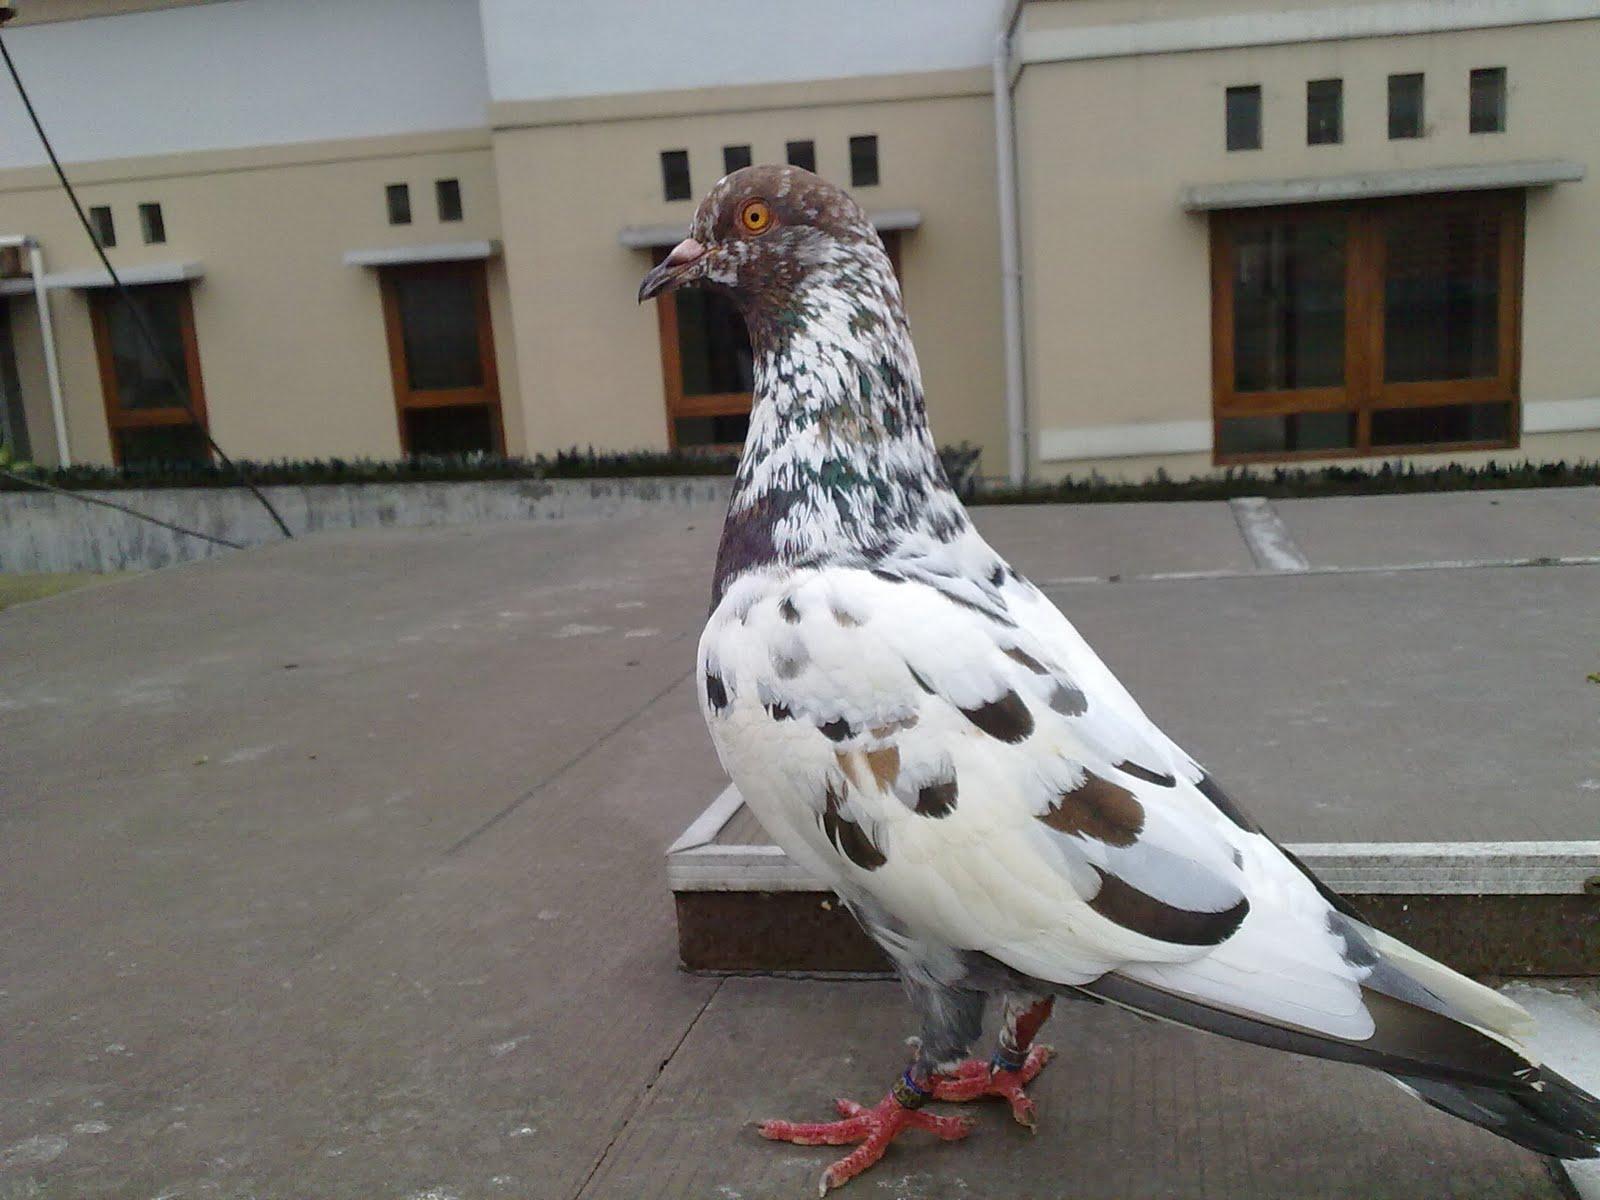 http://4.bp.blogspot.com/-lGiIcRnPgCk/TceHVu_MFXI/AAAAAAAABMg/-ndvDCve-Ko/s1600/Burung-Dara-Merpati-Indukan-2.jpg